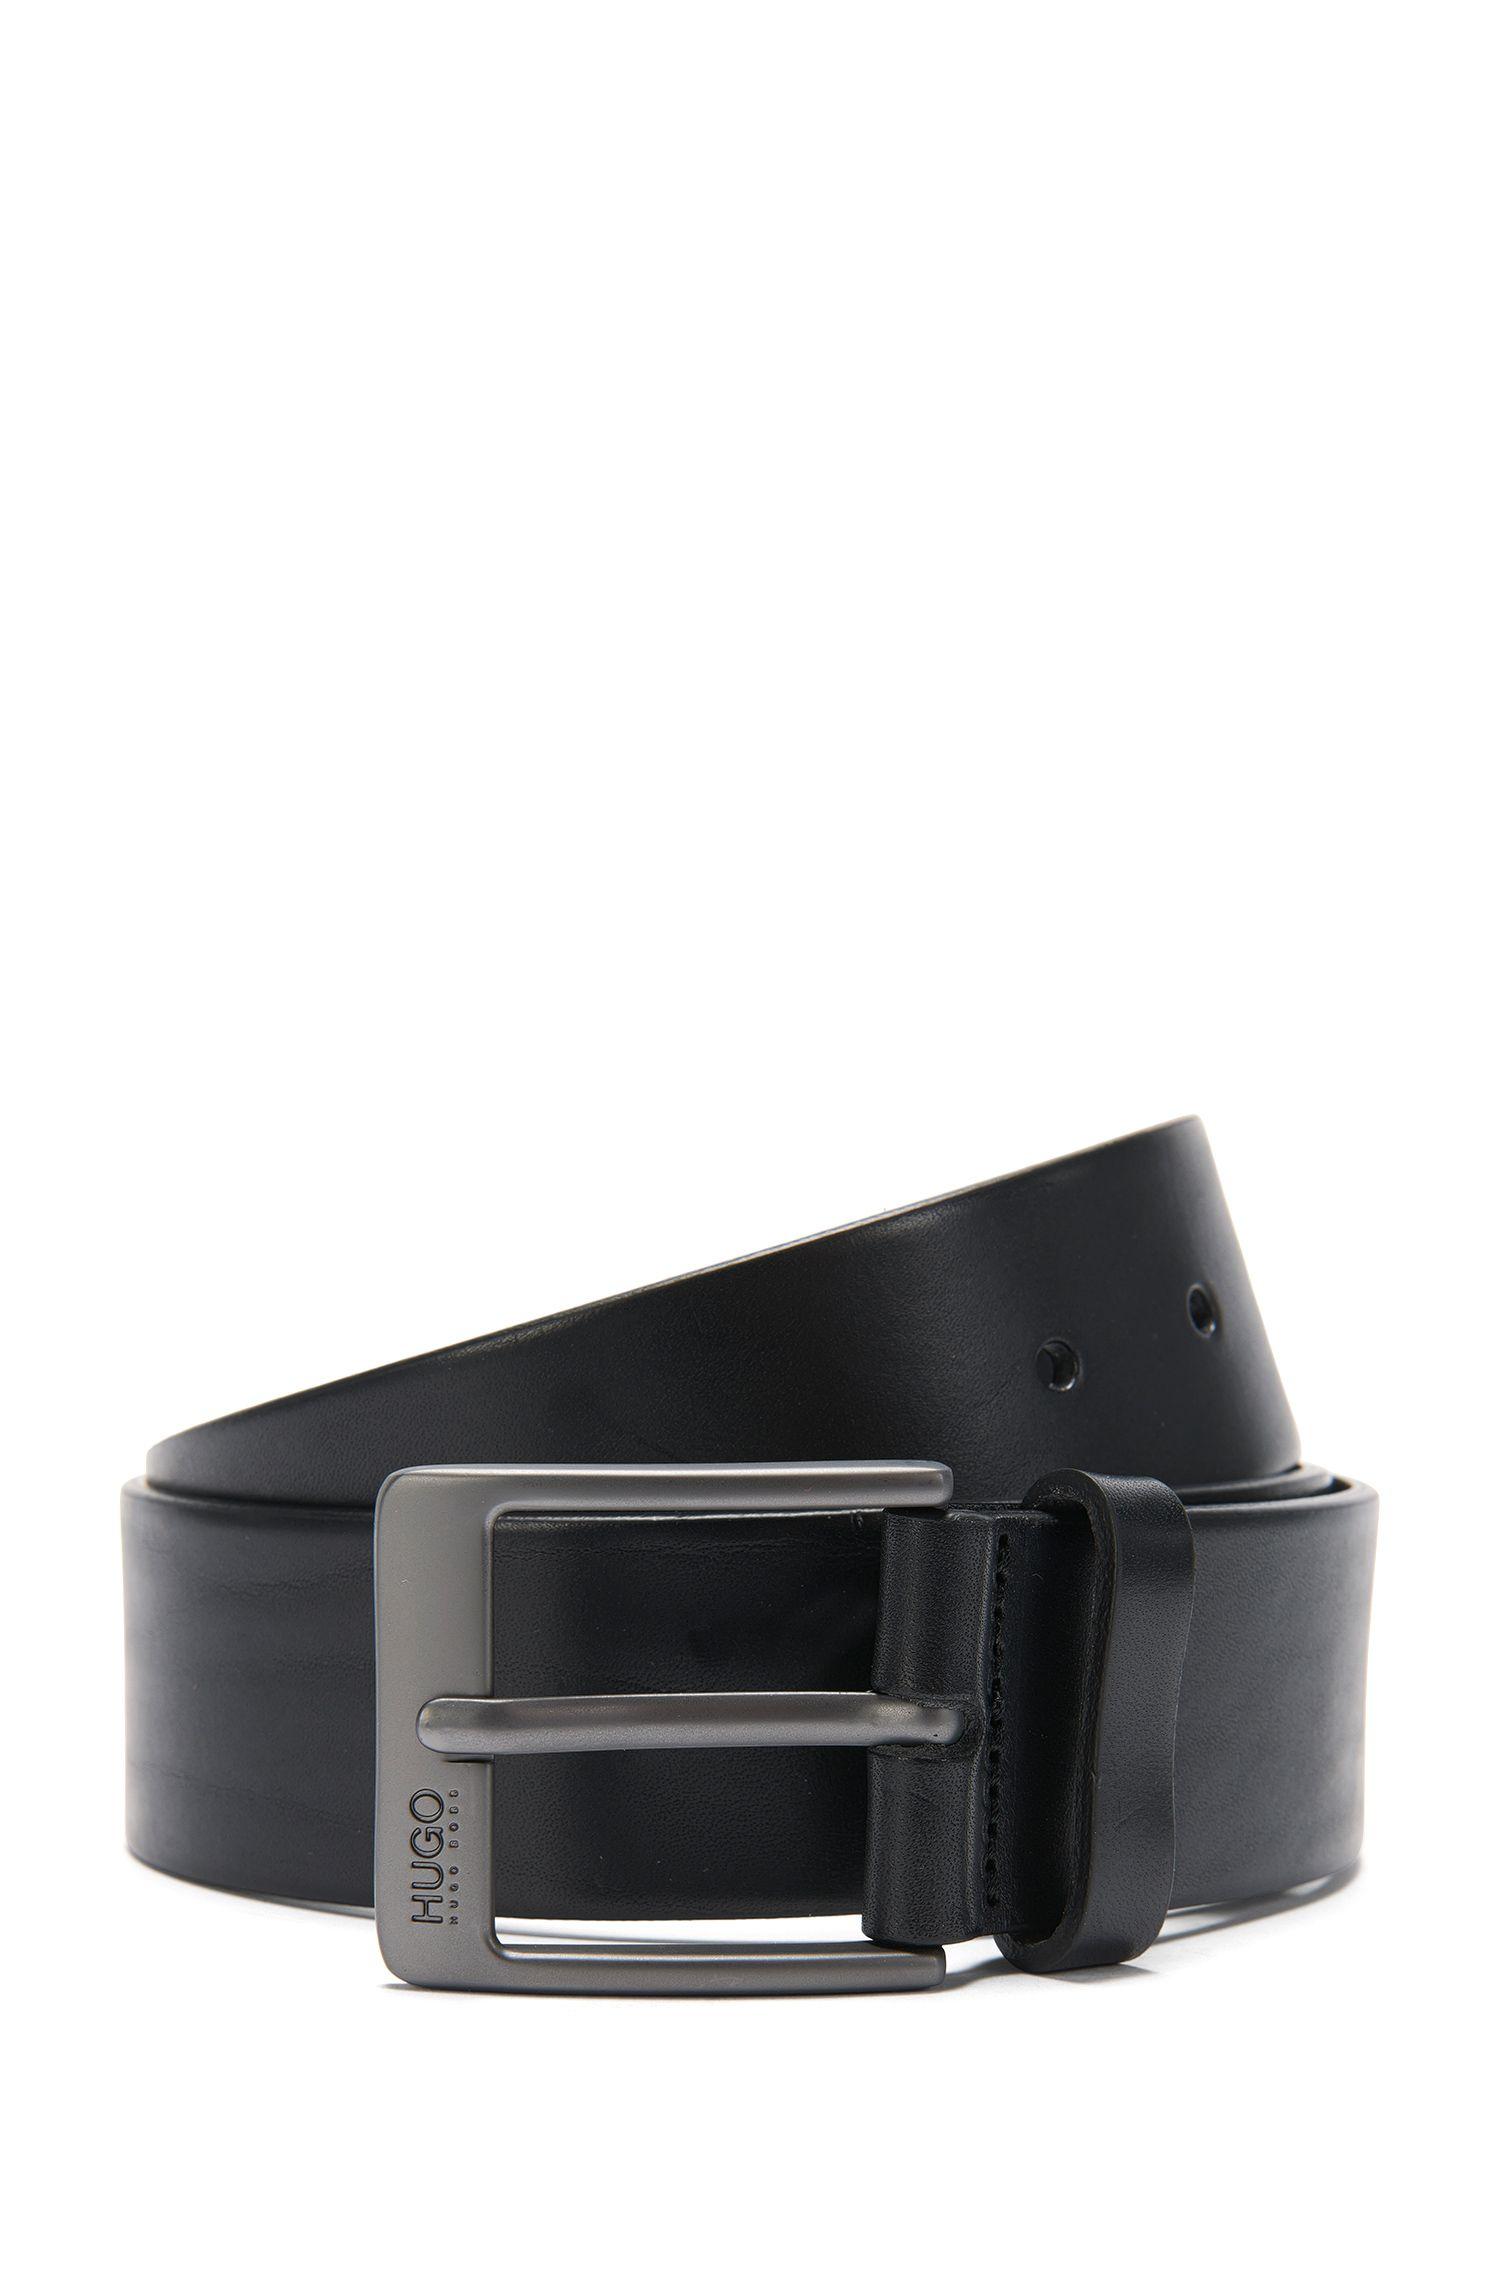 Leather belt with matt gunmetal pin buckle